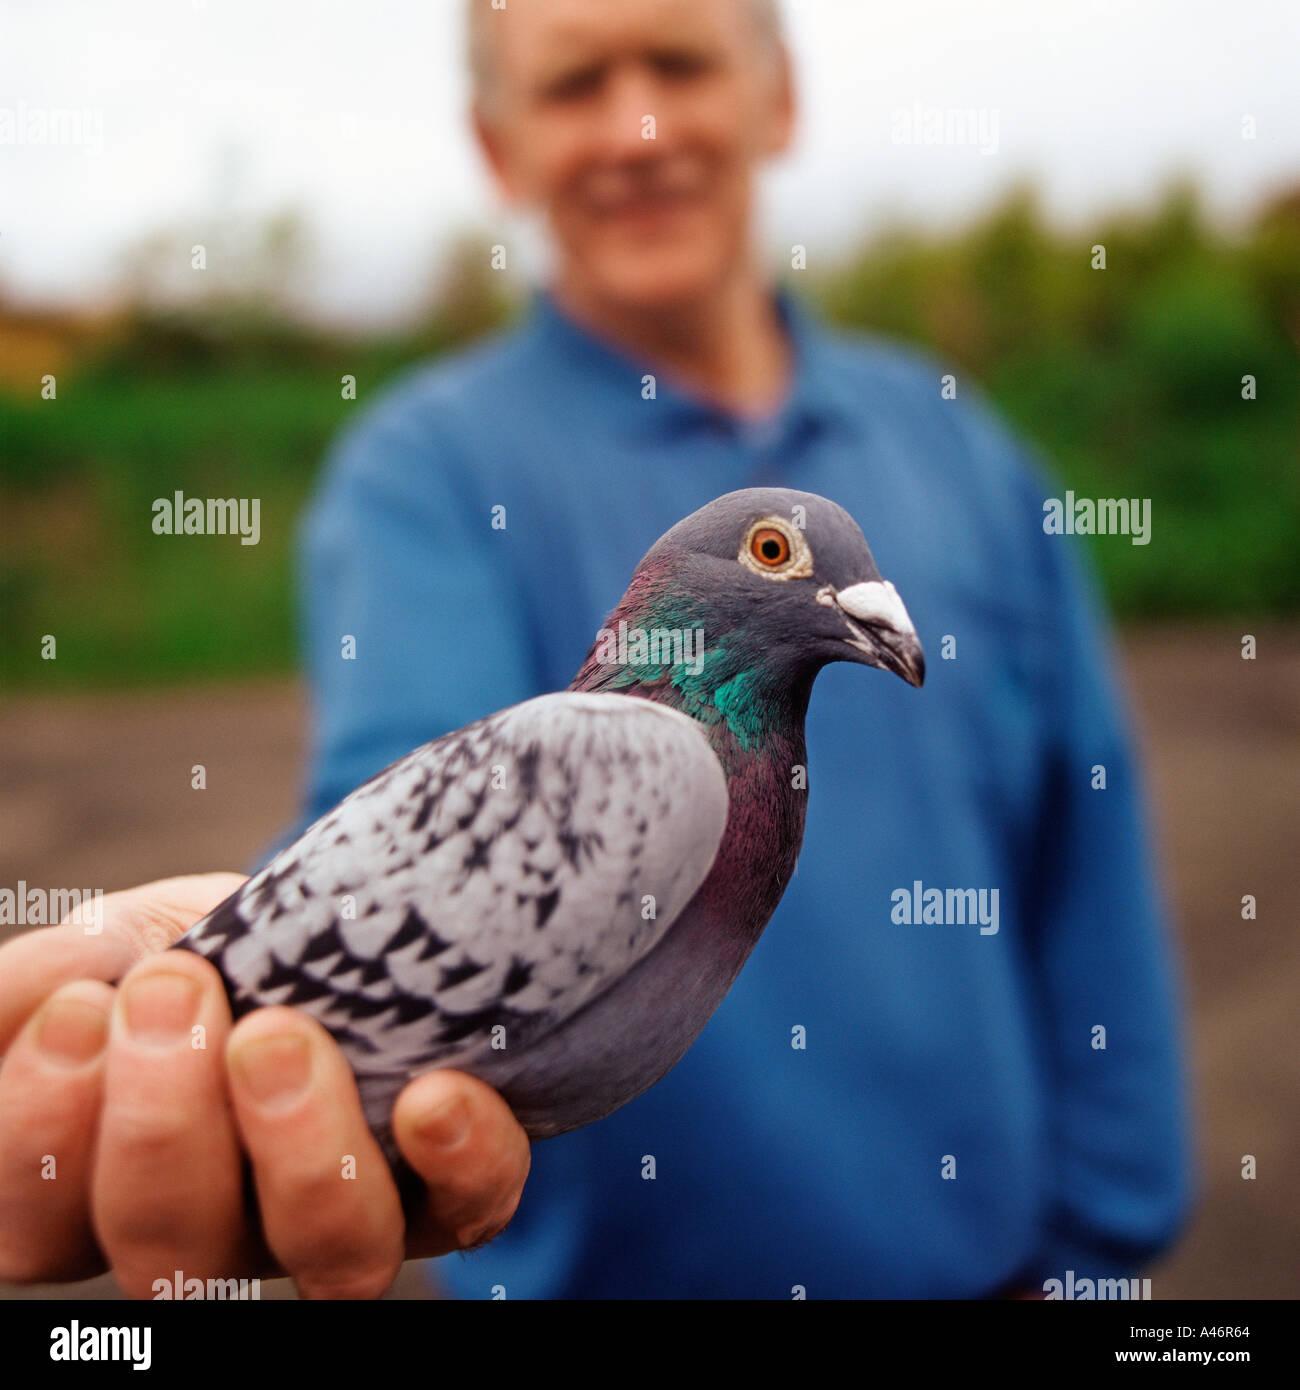 Uomo con pet pigeon Immagini Stock